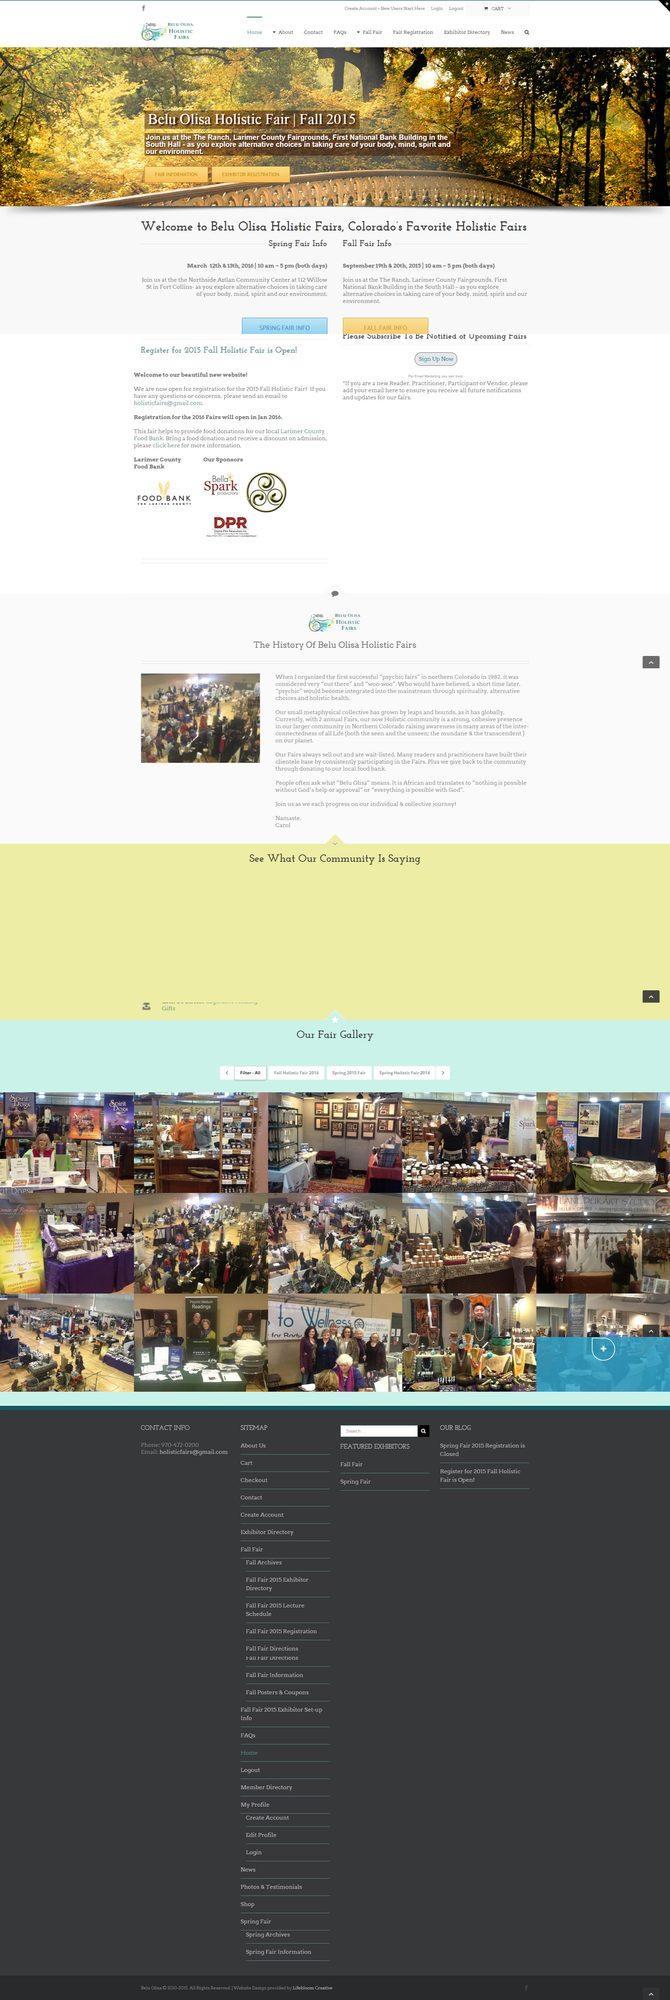 Holistic-Fair---User-Management-Portal